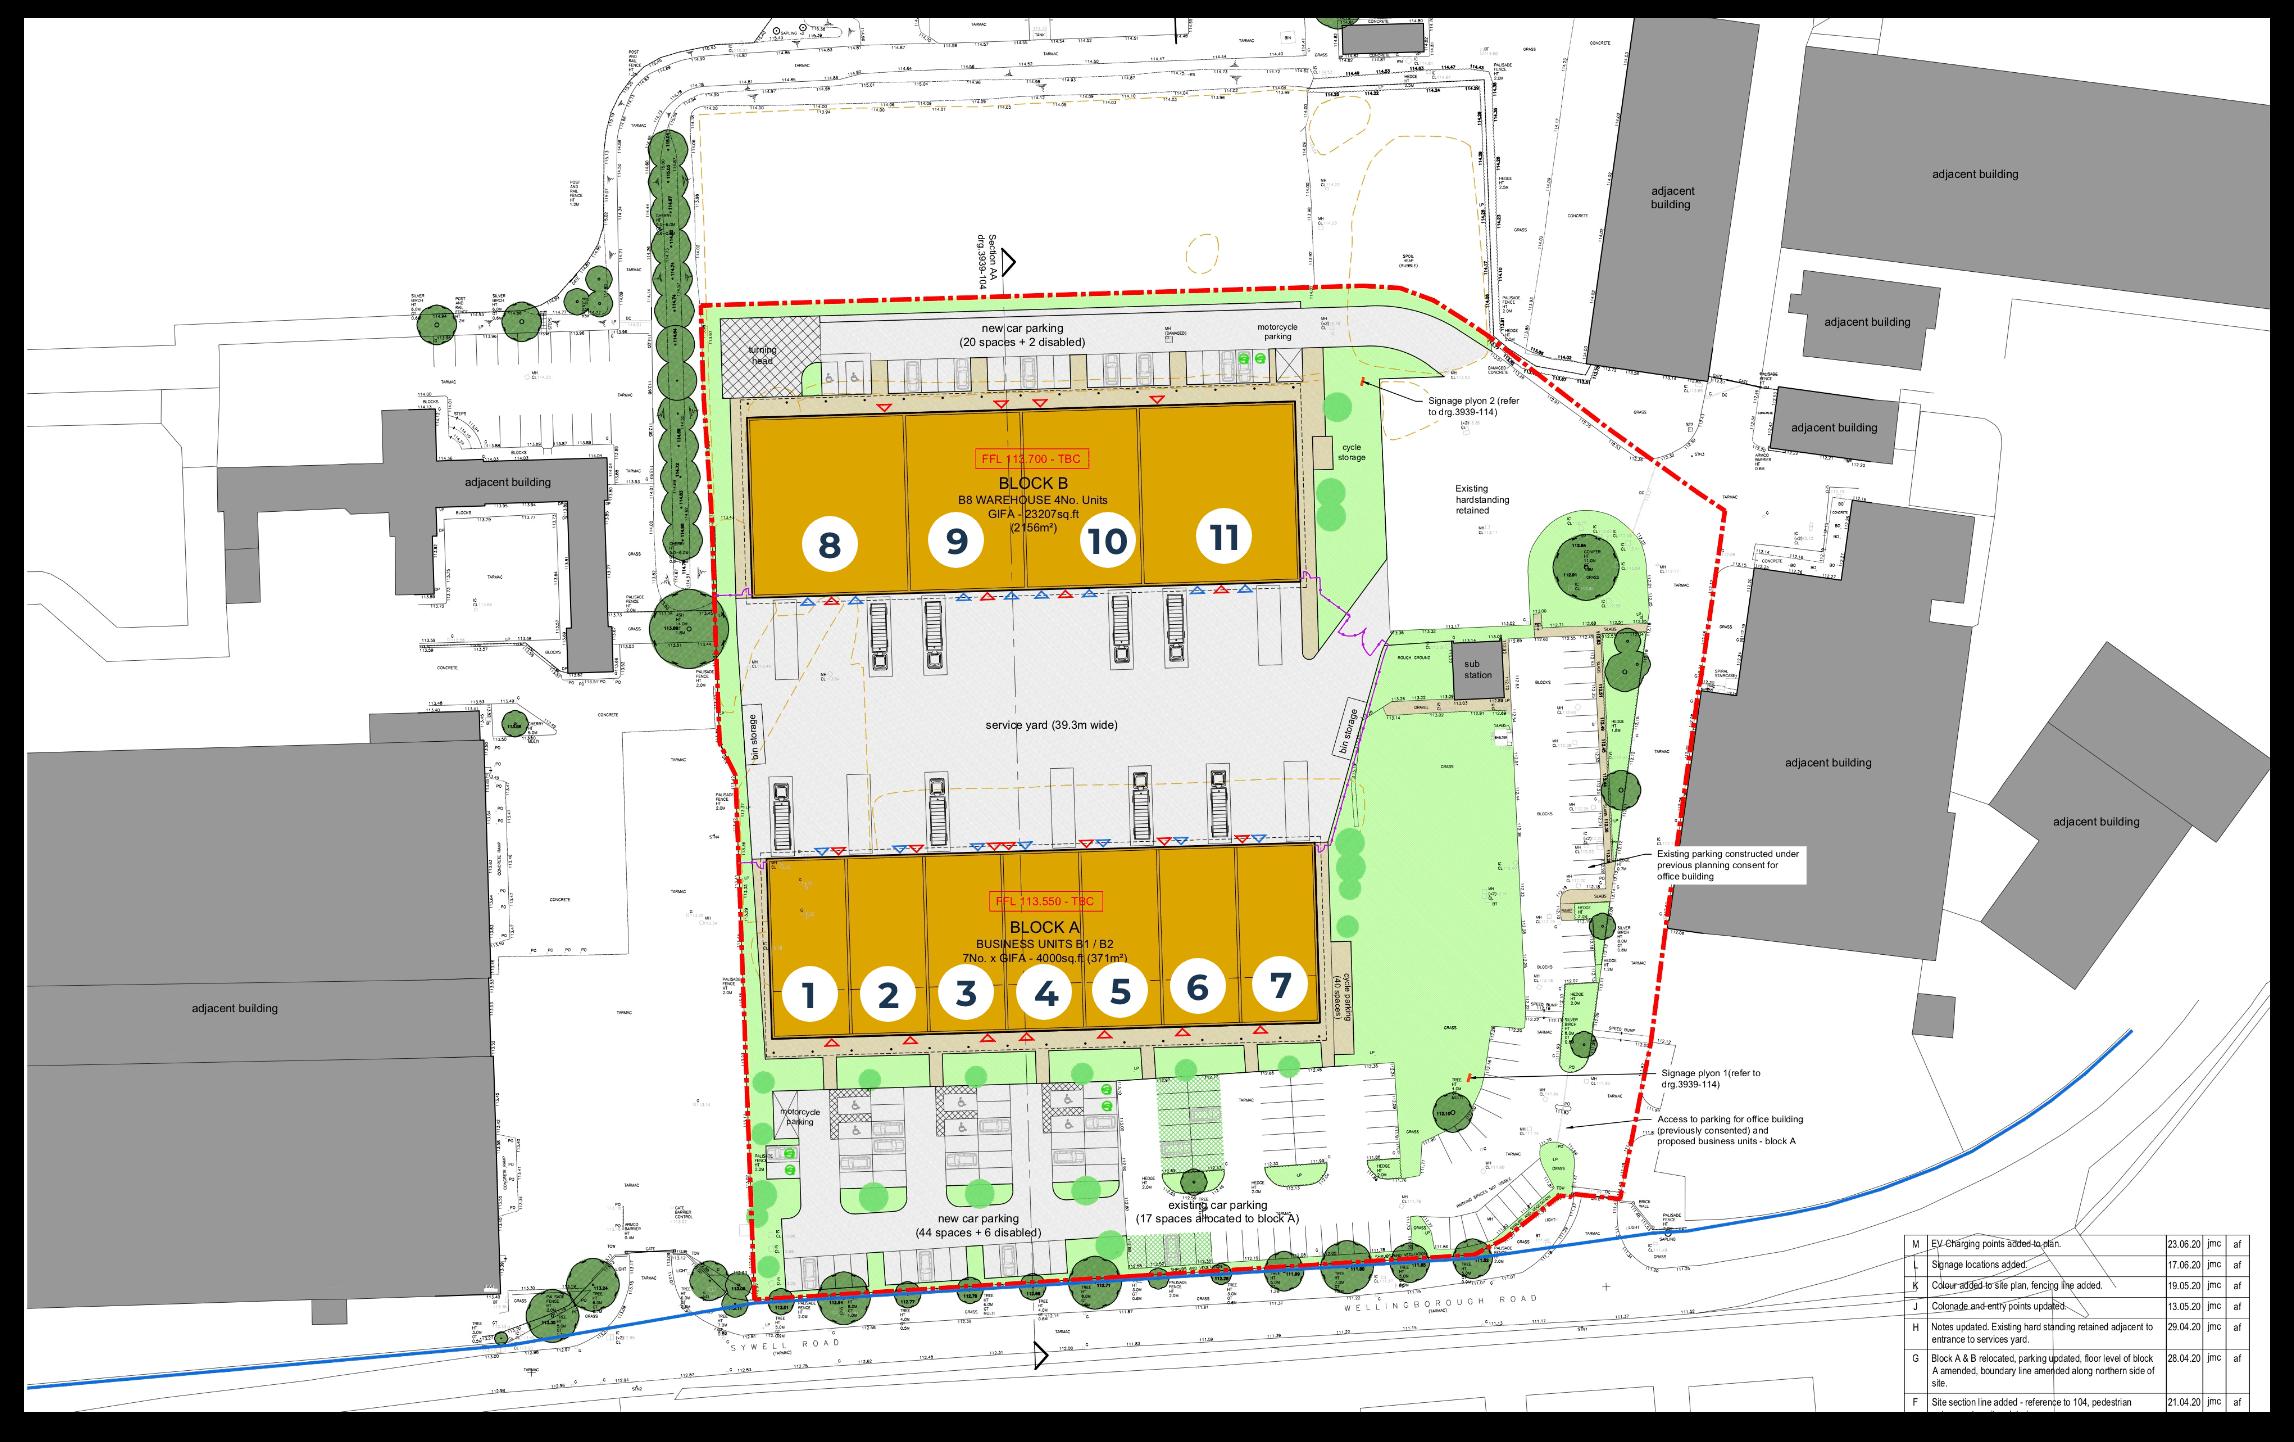 layout of units